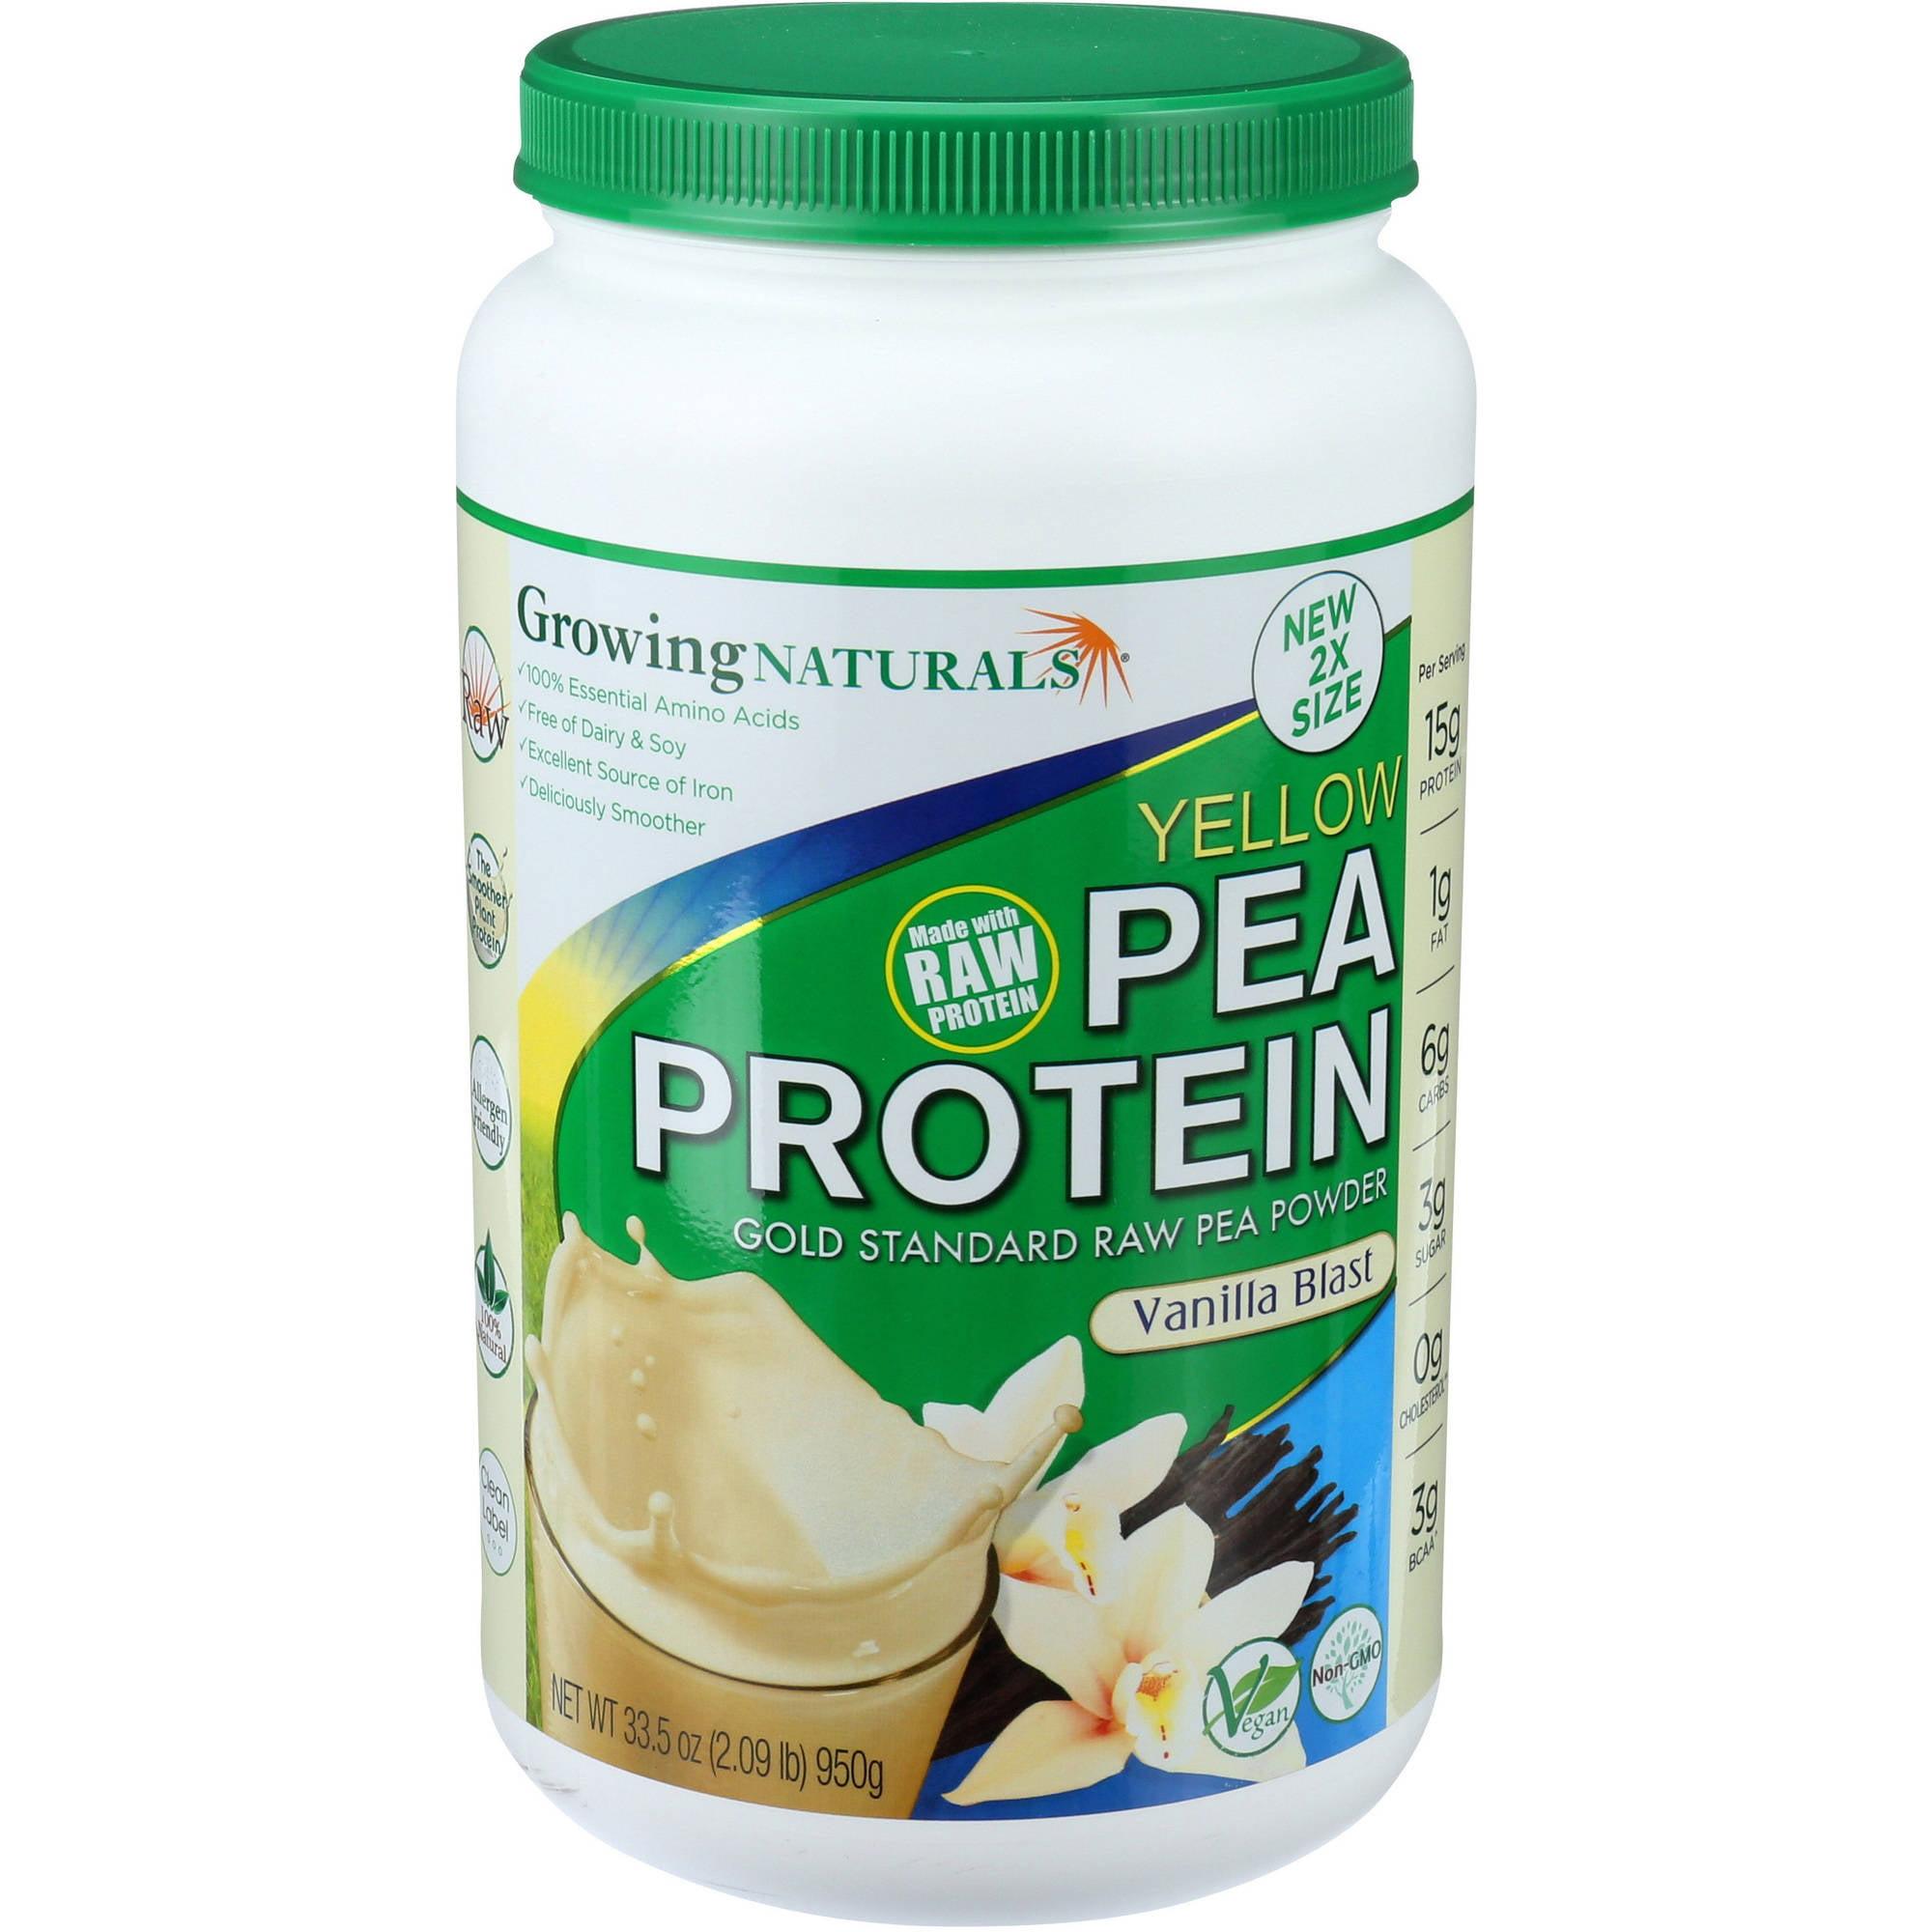 Growing Naturals Protein Pea Powder Vanilla, 33.5 OZ